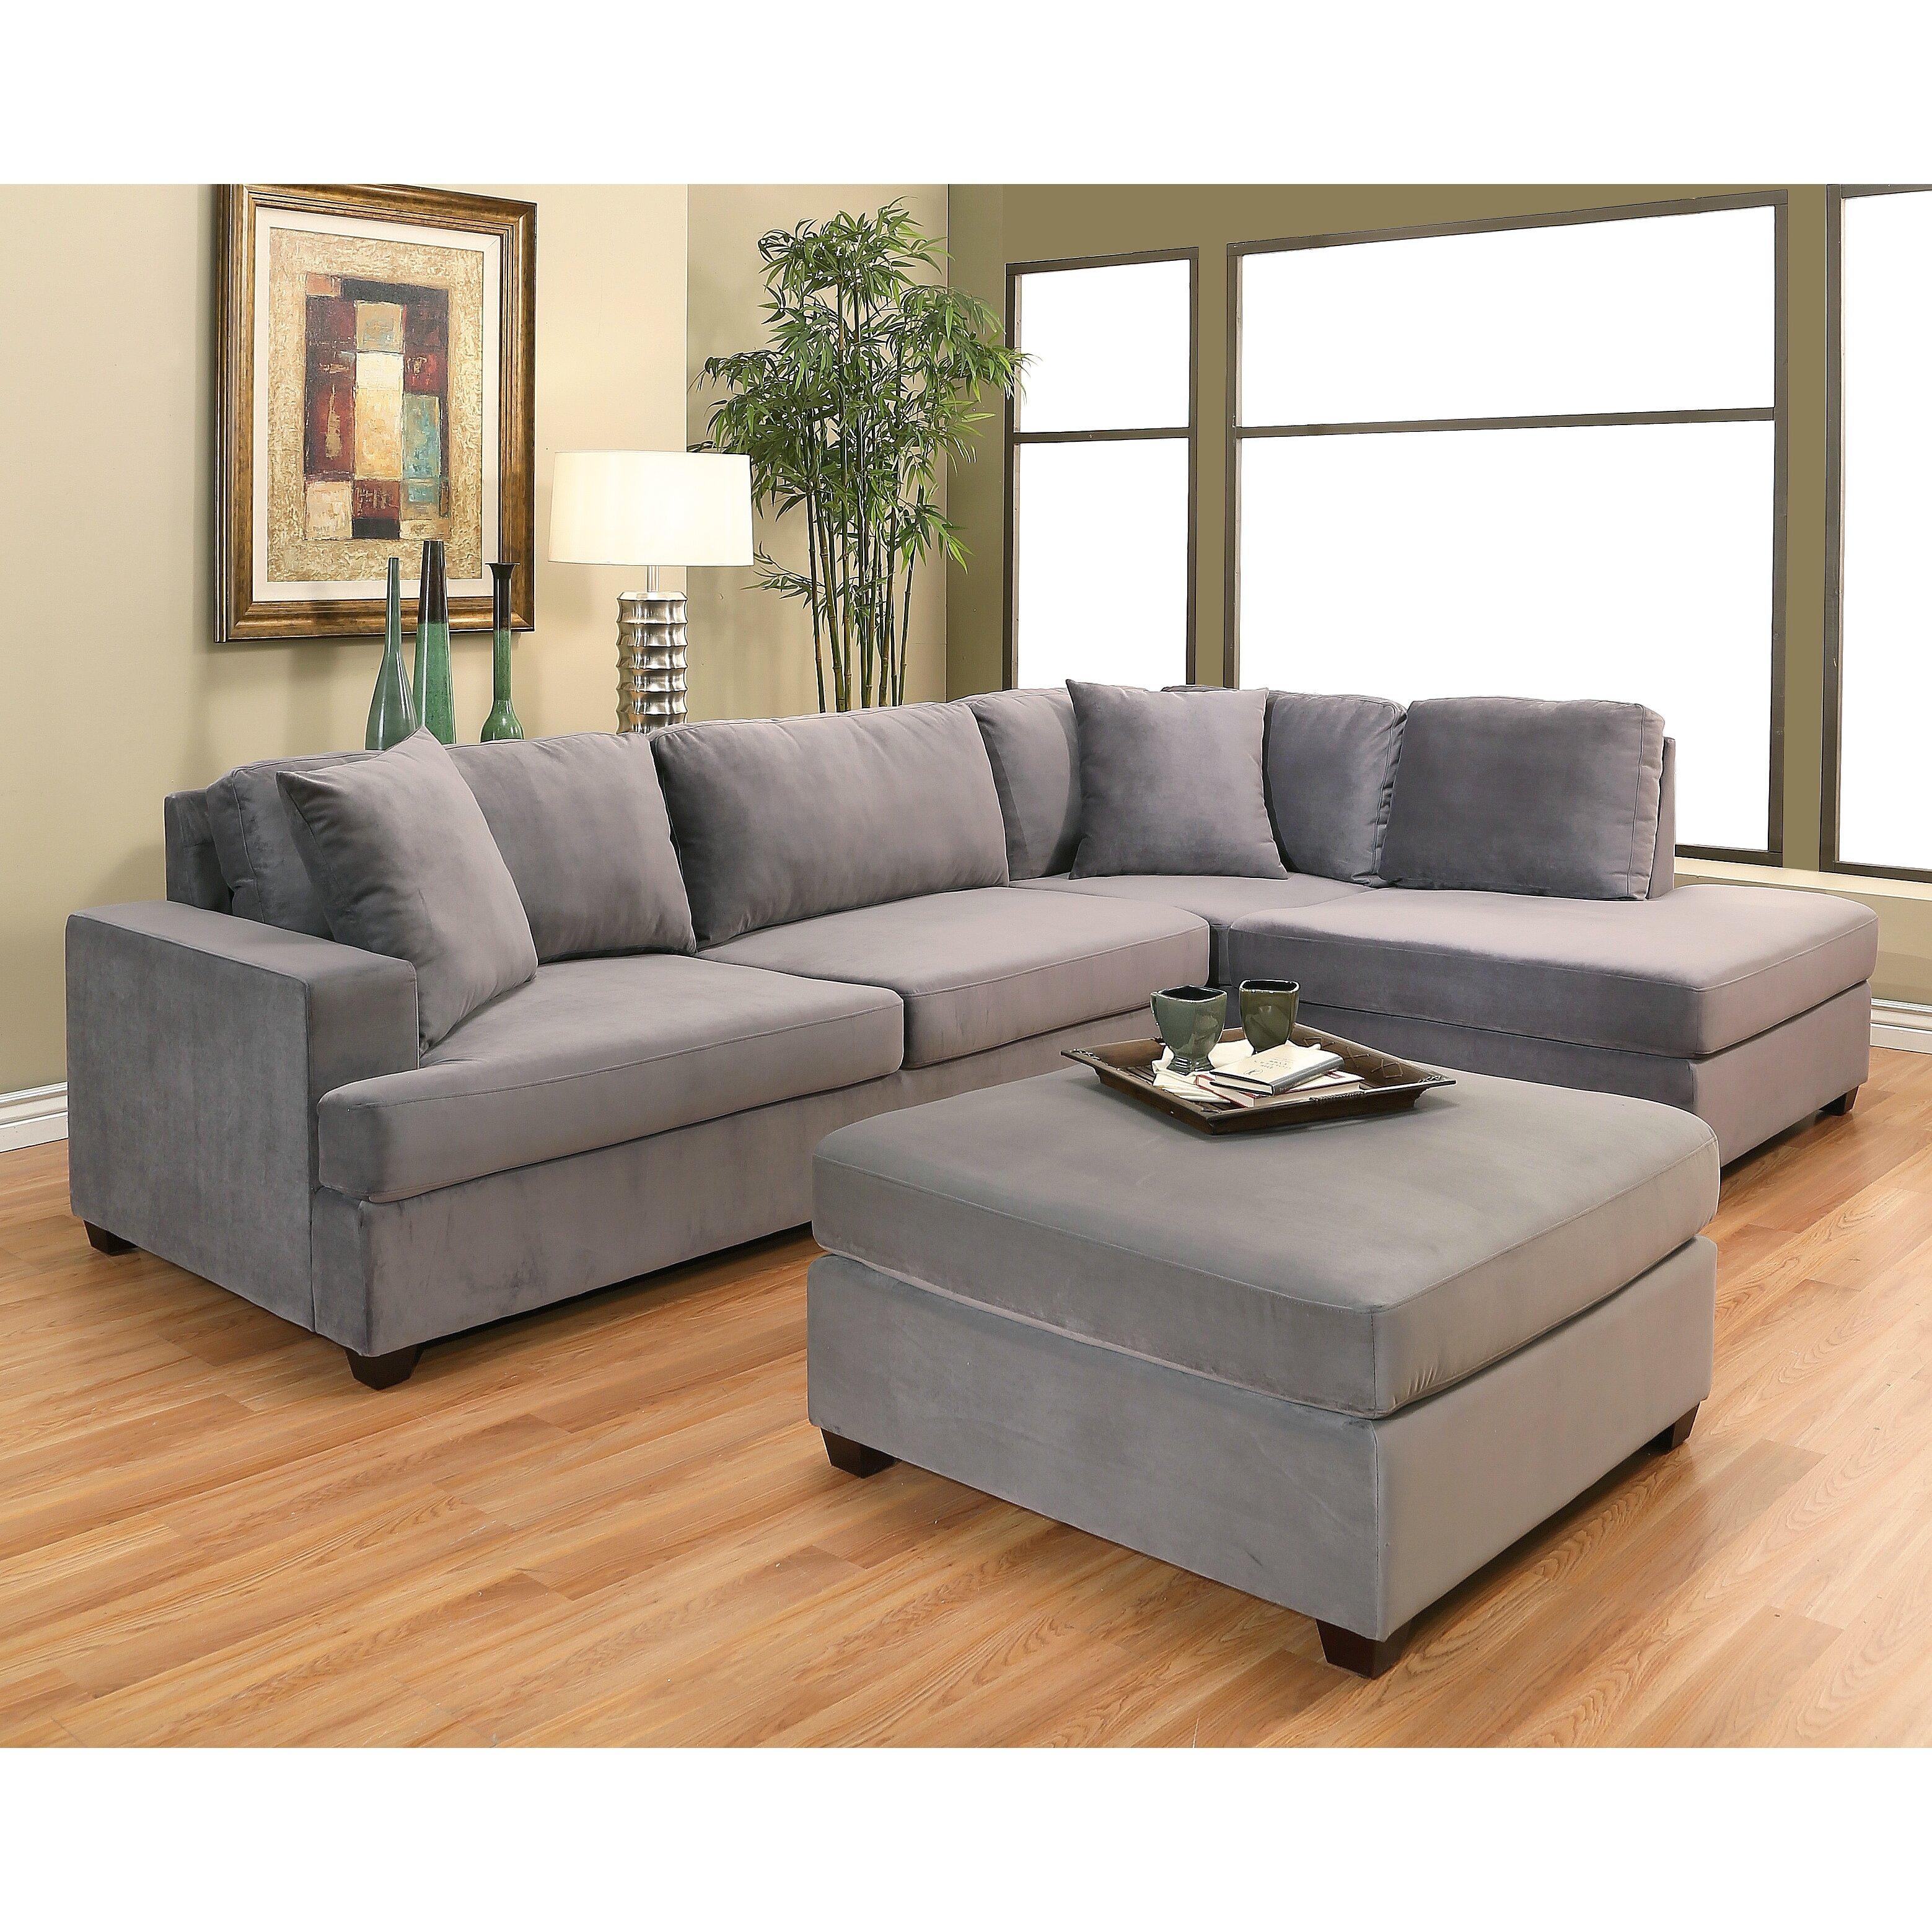 Sectional Sofa In Huntsville Al: Brayden Studio Berryhill Chaise Sectional